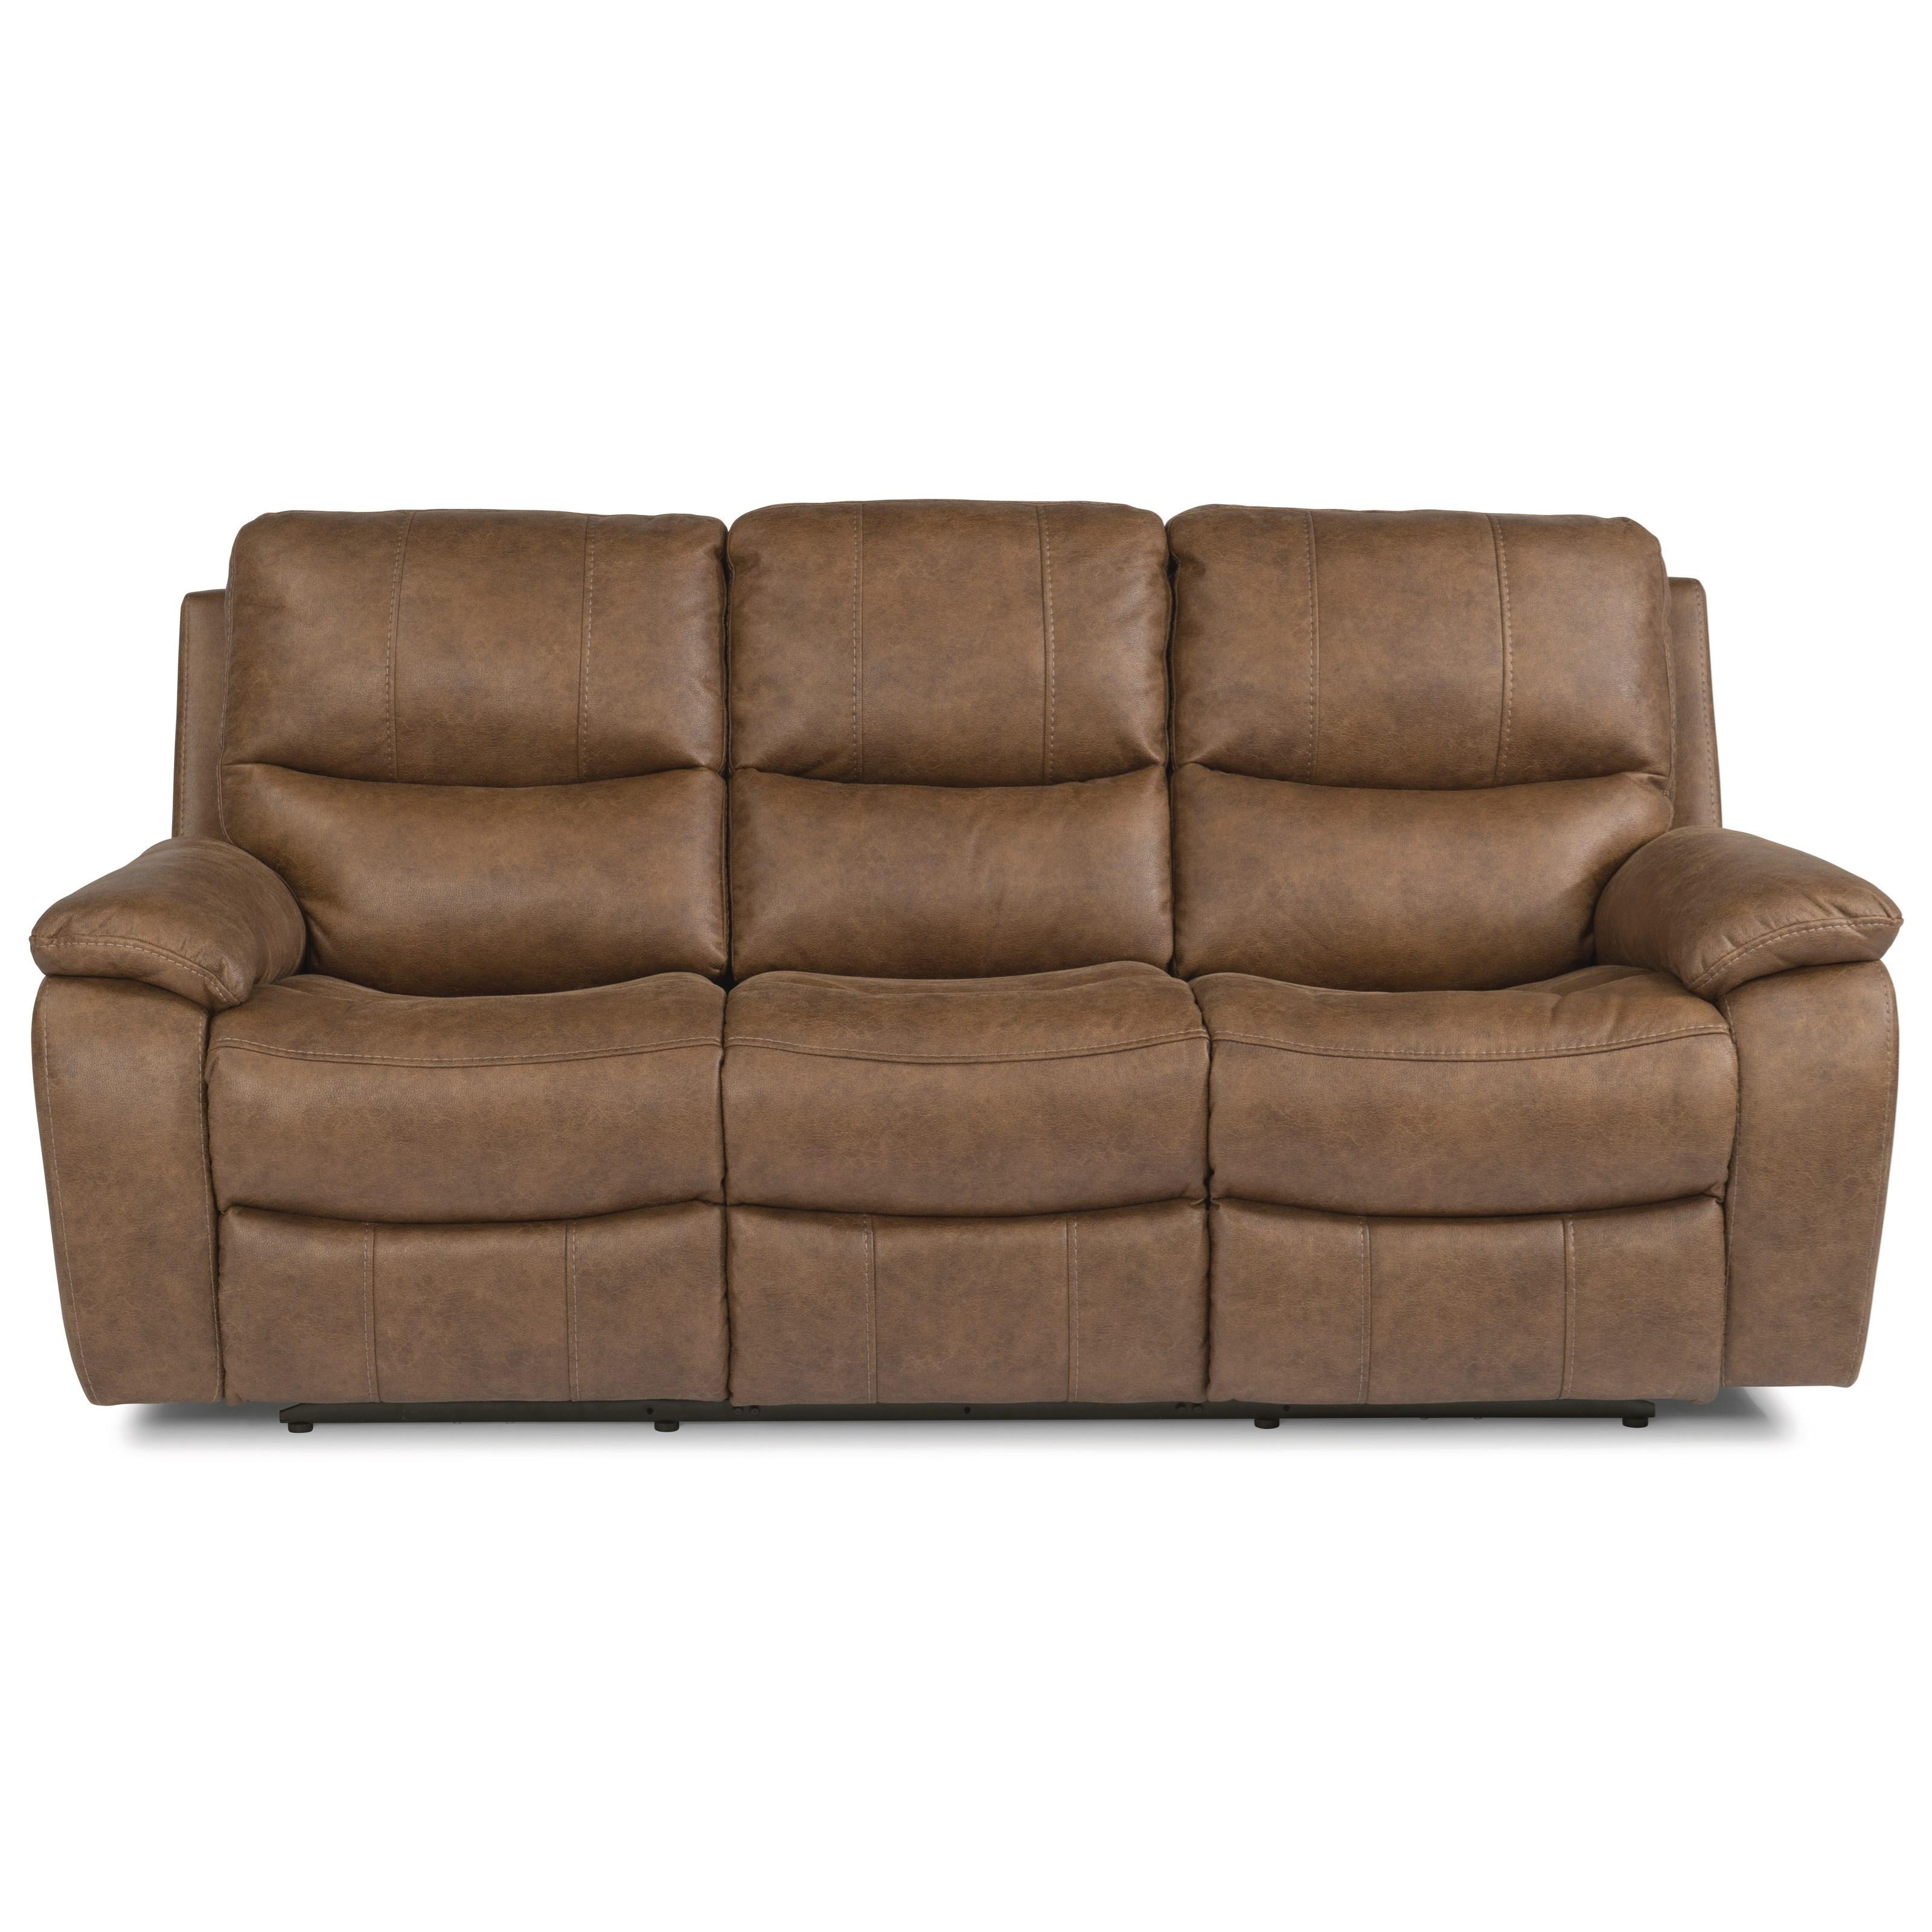 flexsteel sofa sets leather costco latitudes hendrix 1193 62ph power reclining with hendrixpower